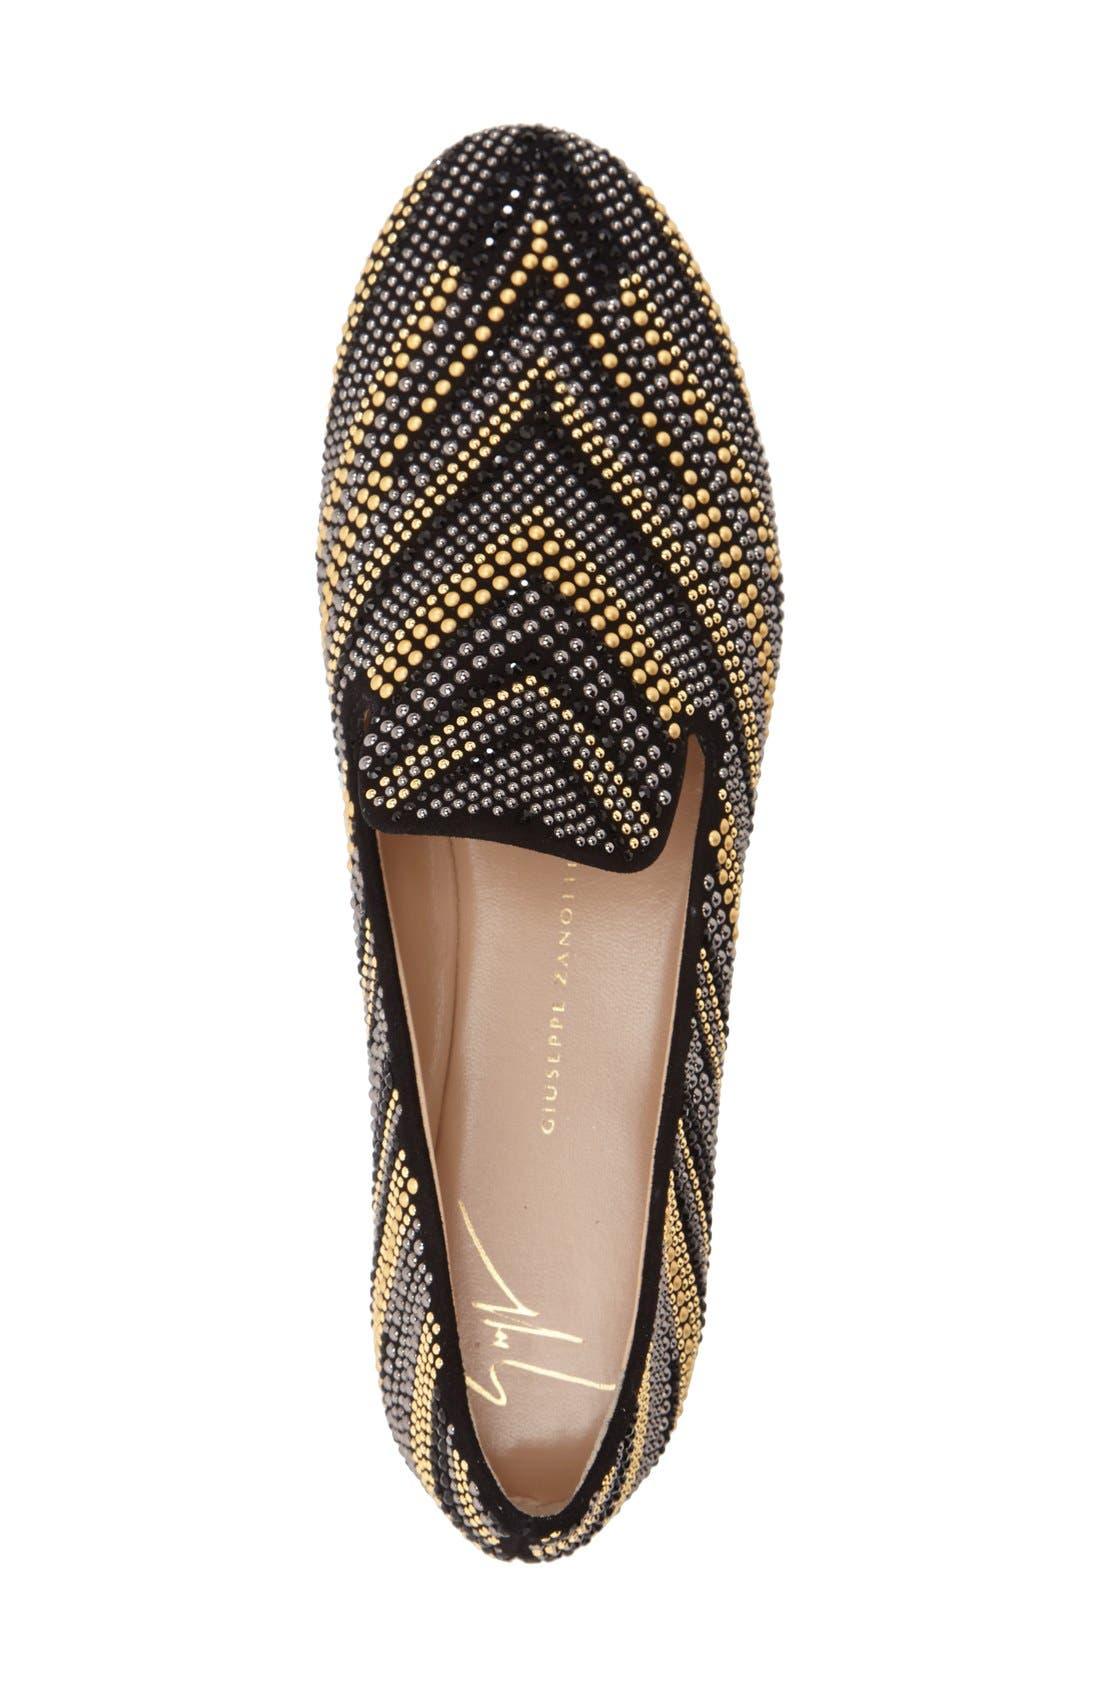 Alternate Image 3  - Giuseppe Zanotti 'Dalila - Embellished' Swarovski Crystal Loafer (Women)